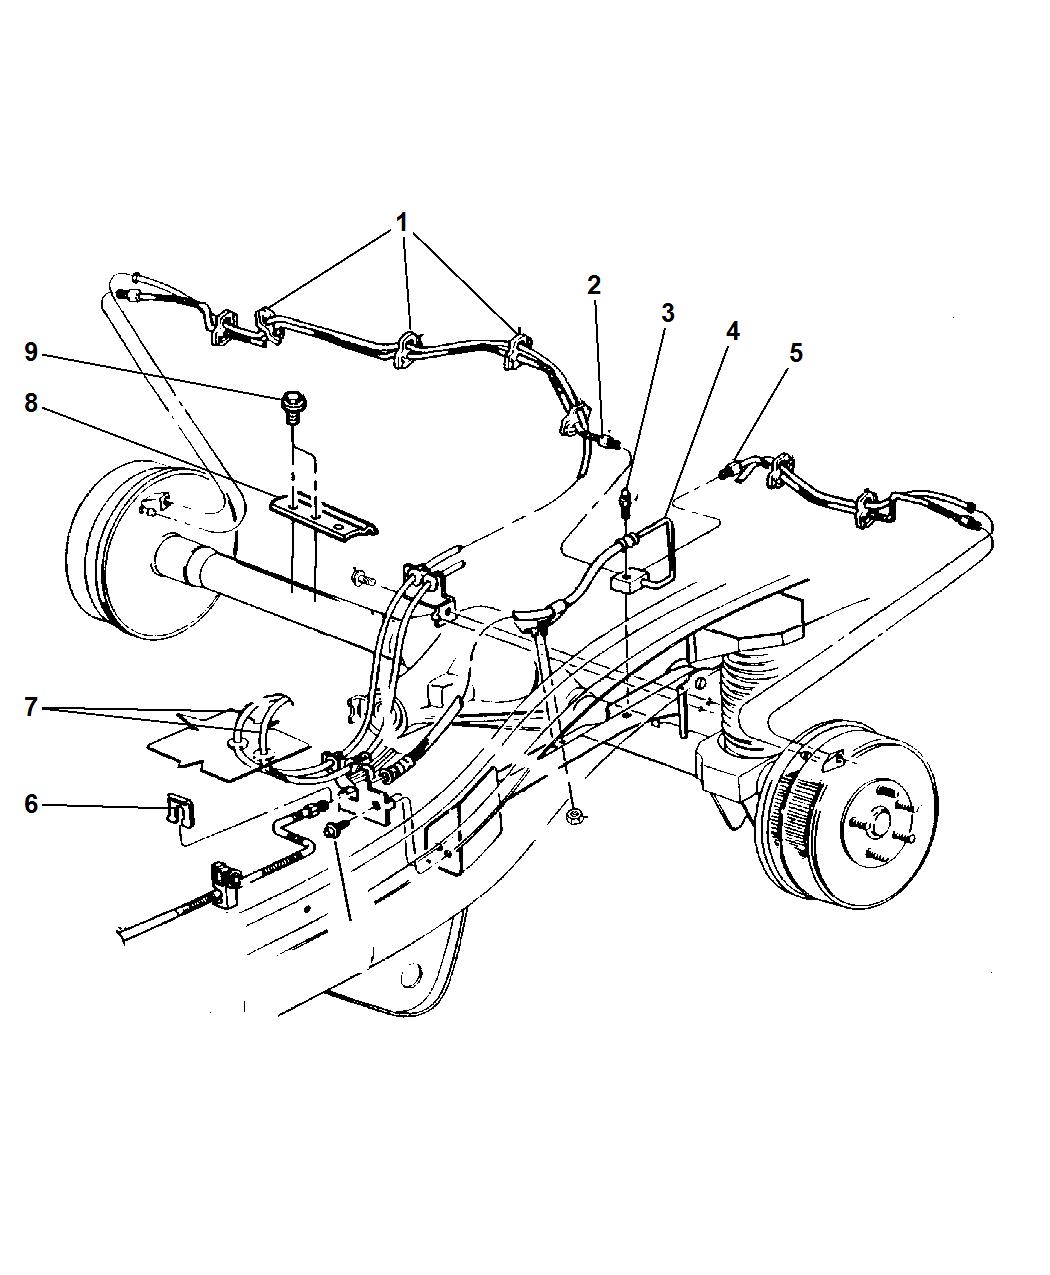 Jeep Brakes Diagram 2002 Acura Tl Engine Diagram Fusebox Yenpancane Jeanjaures37 Fr